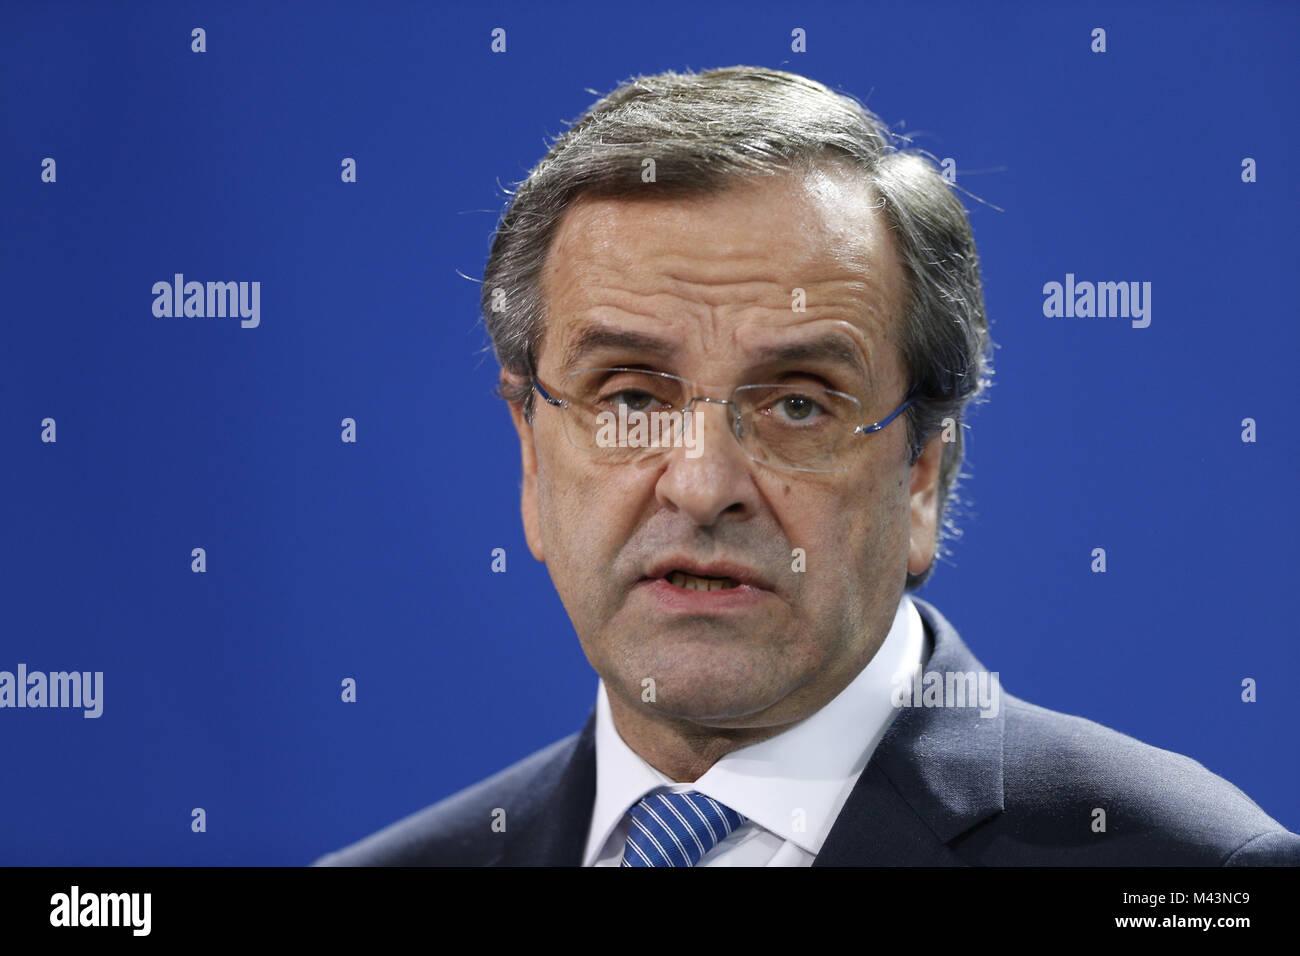 Samaras meets Merkel  in Berlin. - Stock Image